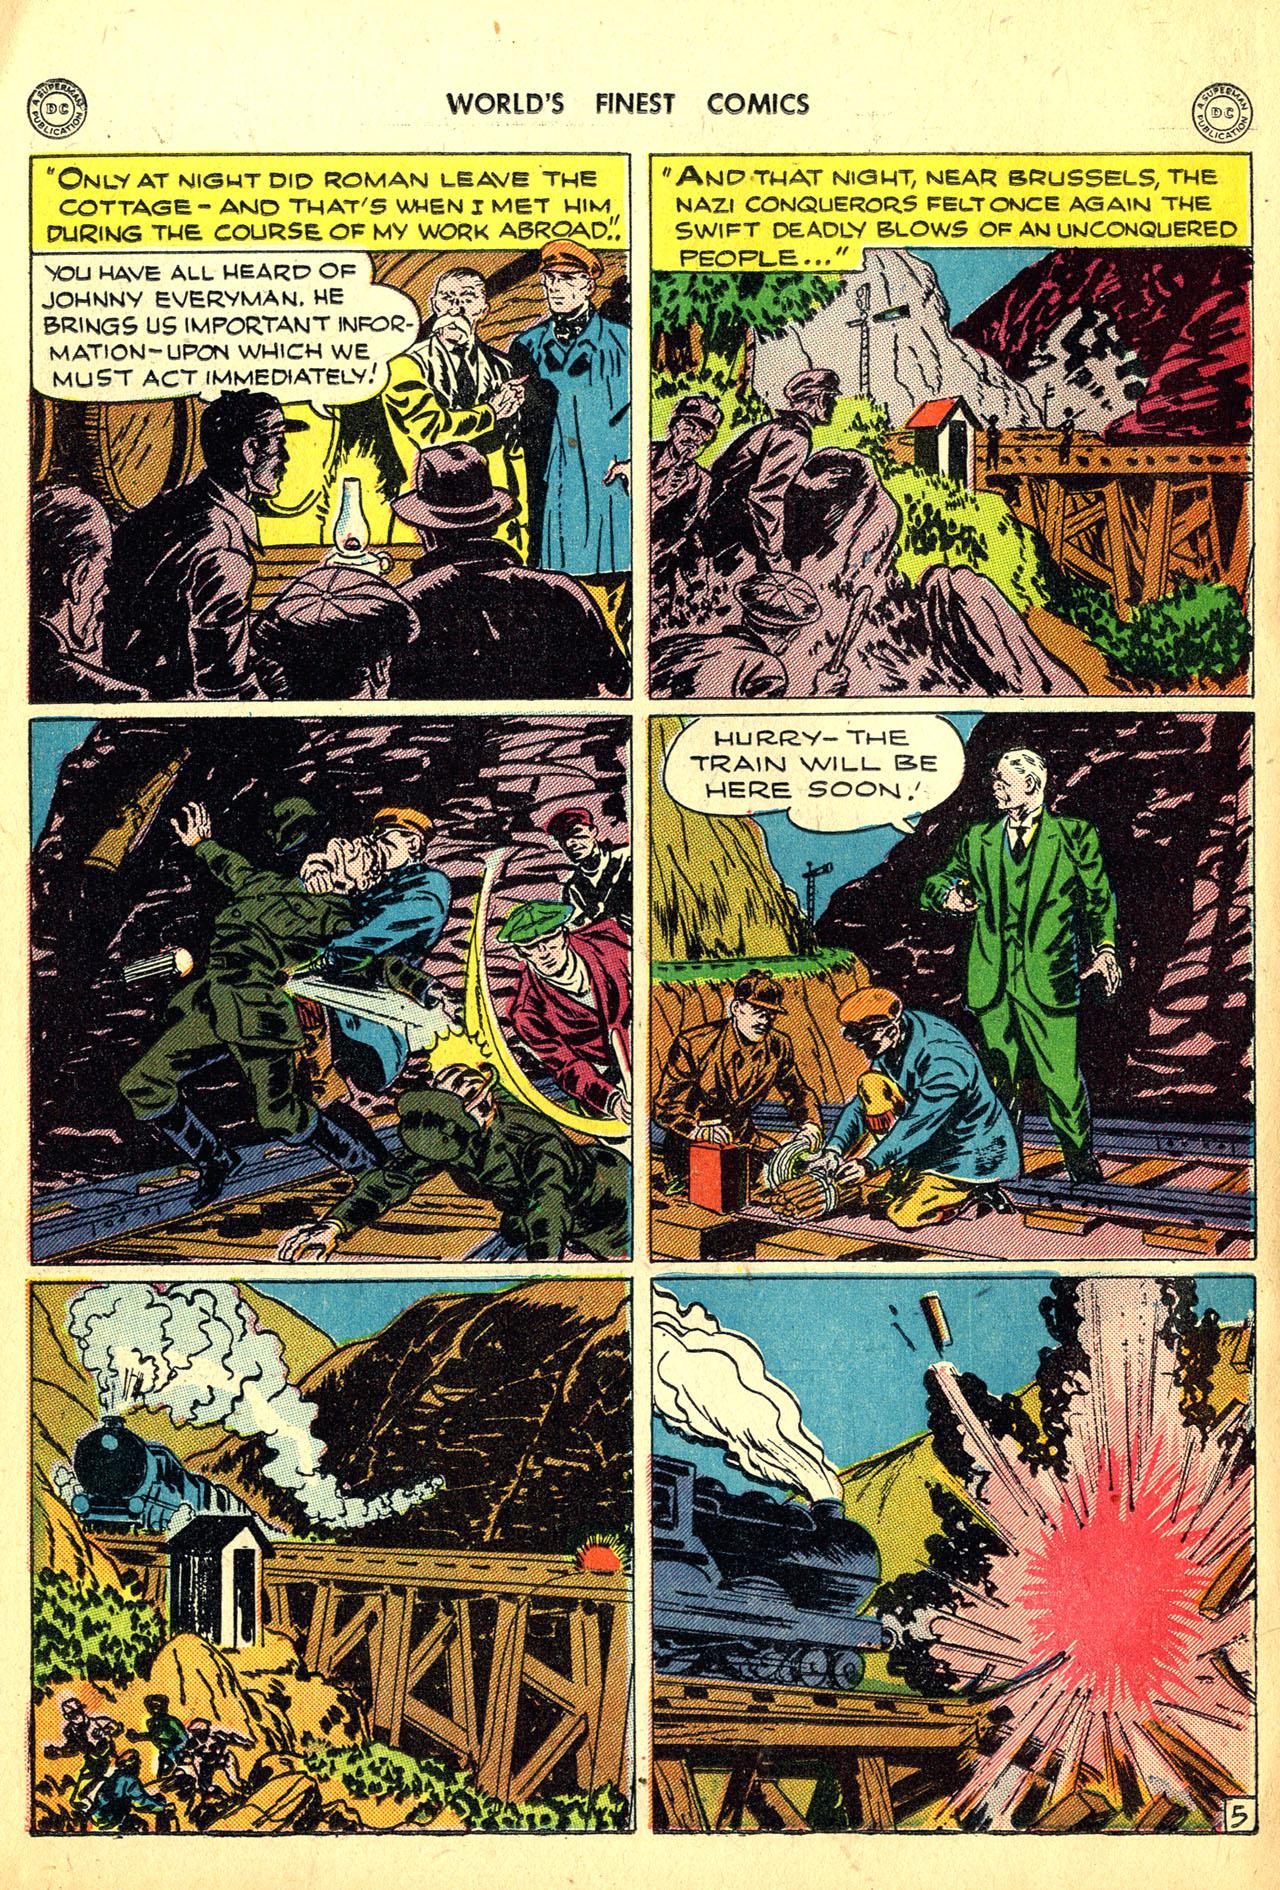 Read online World's Finest Comics comic -  Issue #18 - 64